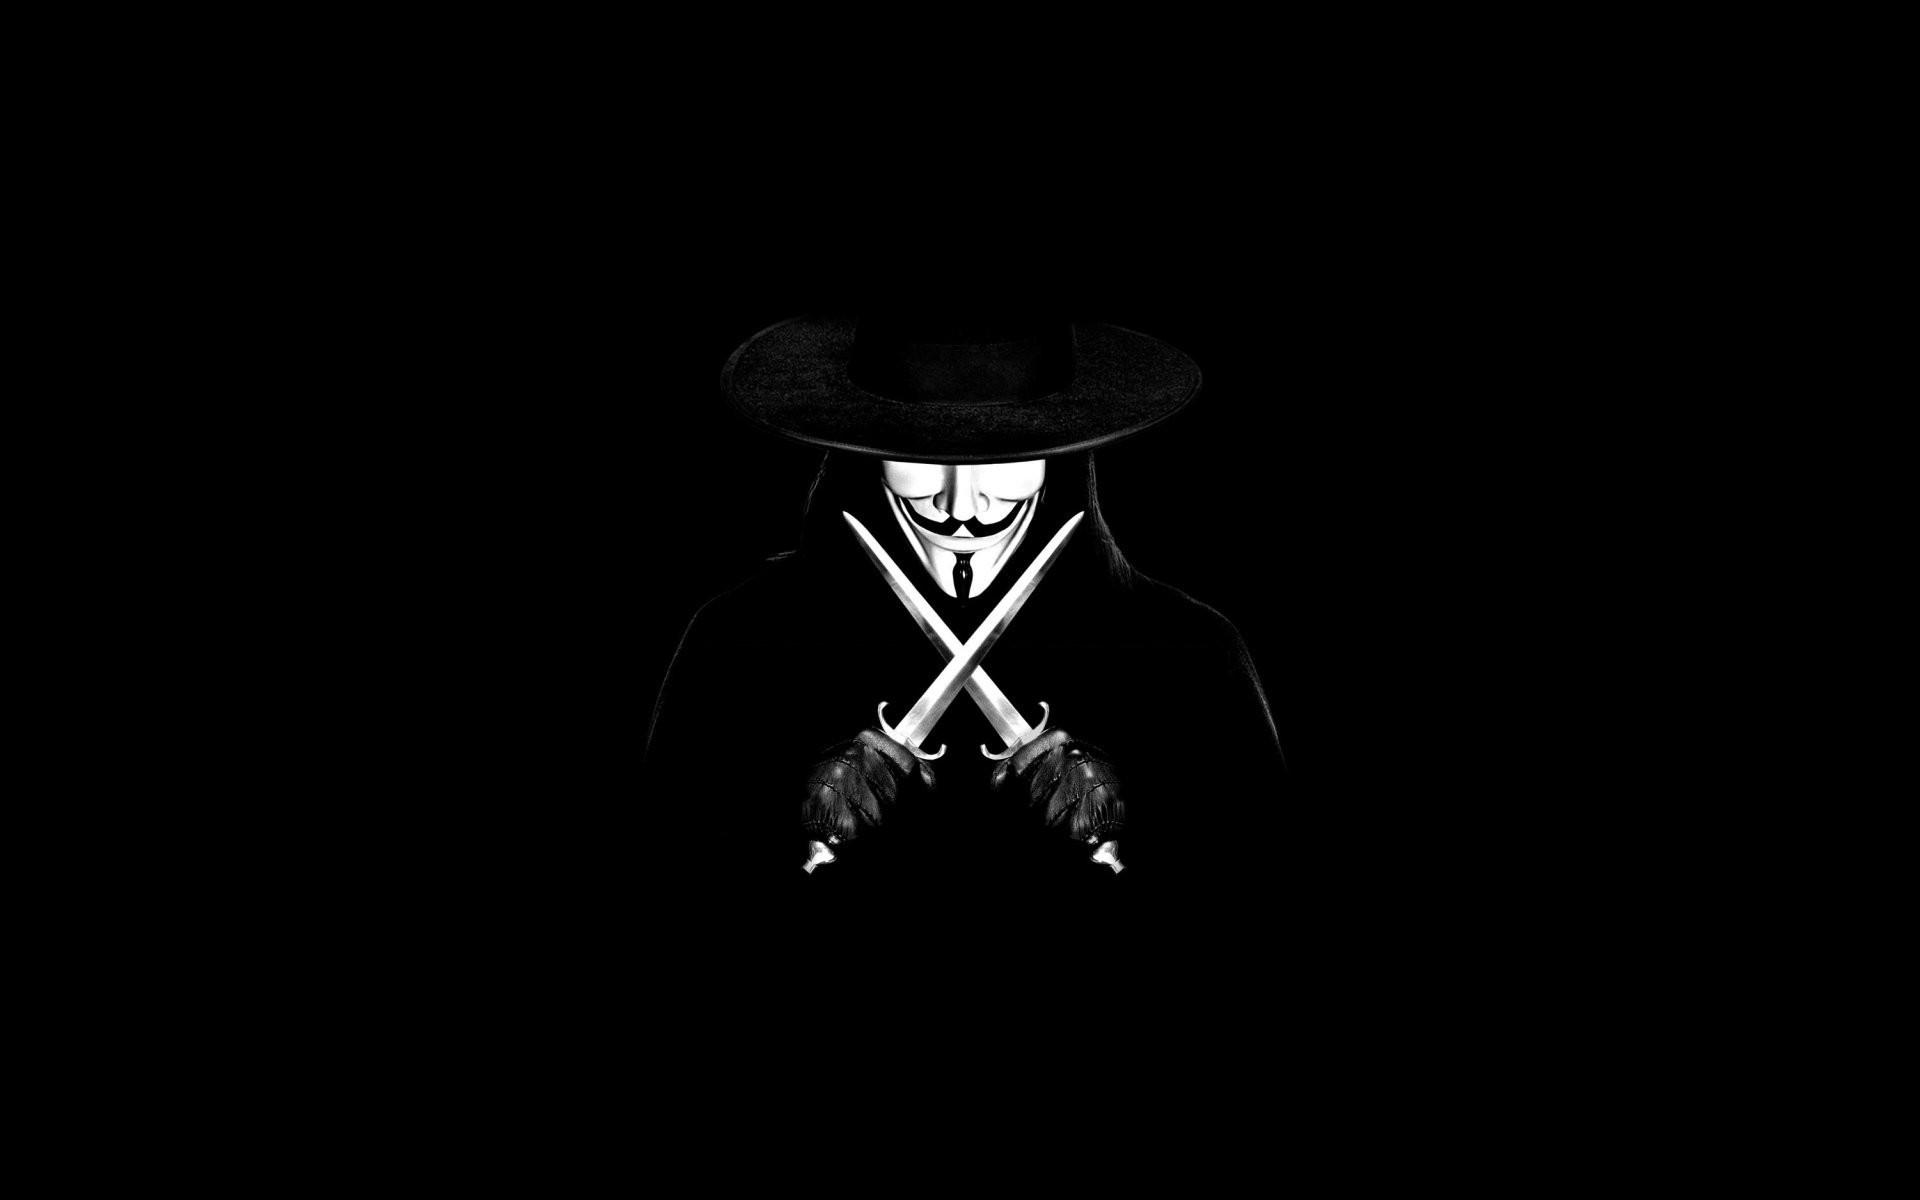 V For Vendetta Wallpaper Hd 75 Images